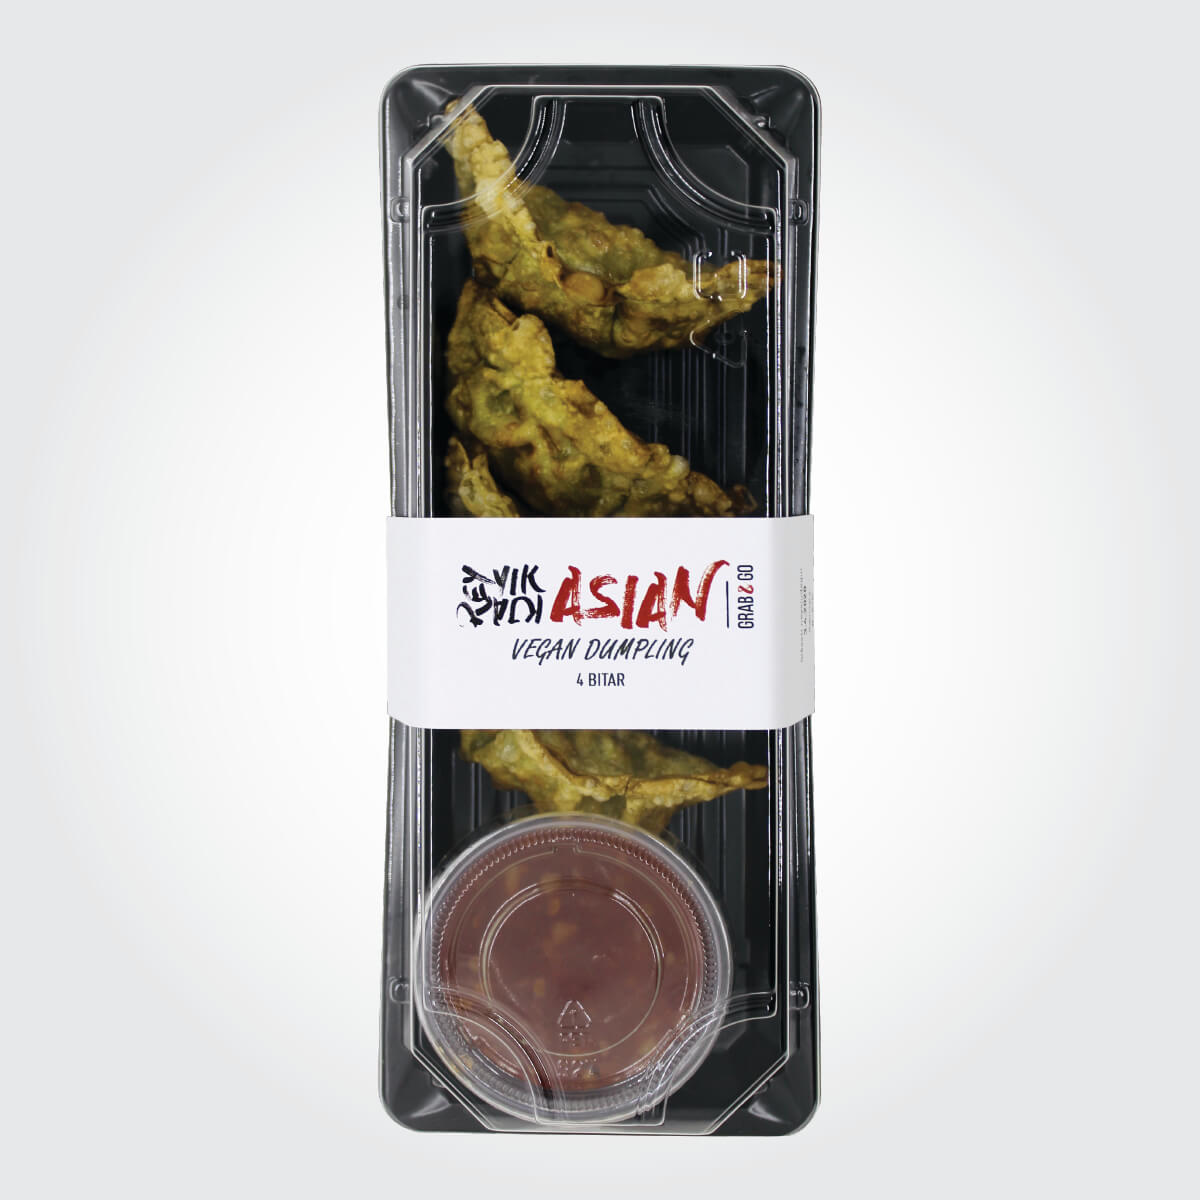 Vegan dumplings - 4 bitar - Reykjavík Asian